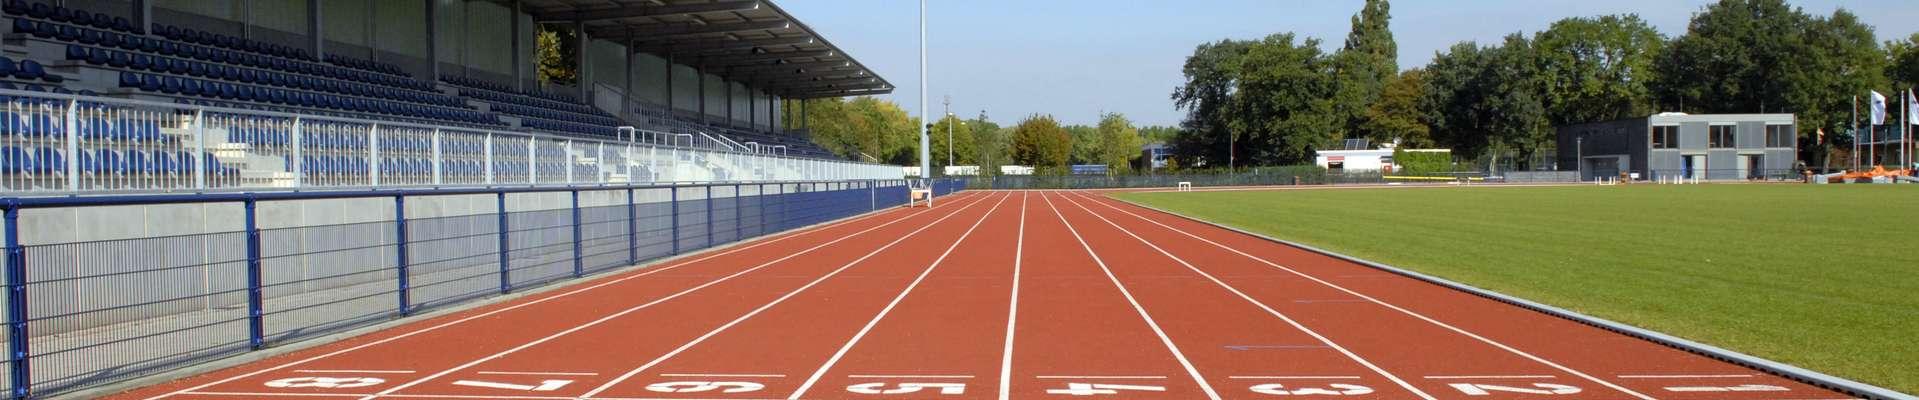 Headerbild Sporträume & Umwelt: Sportstadion